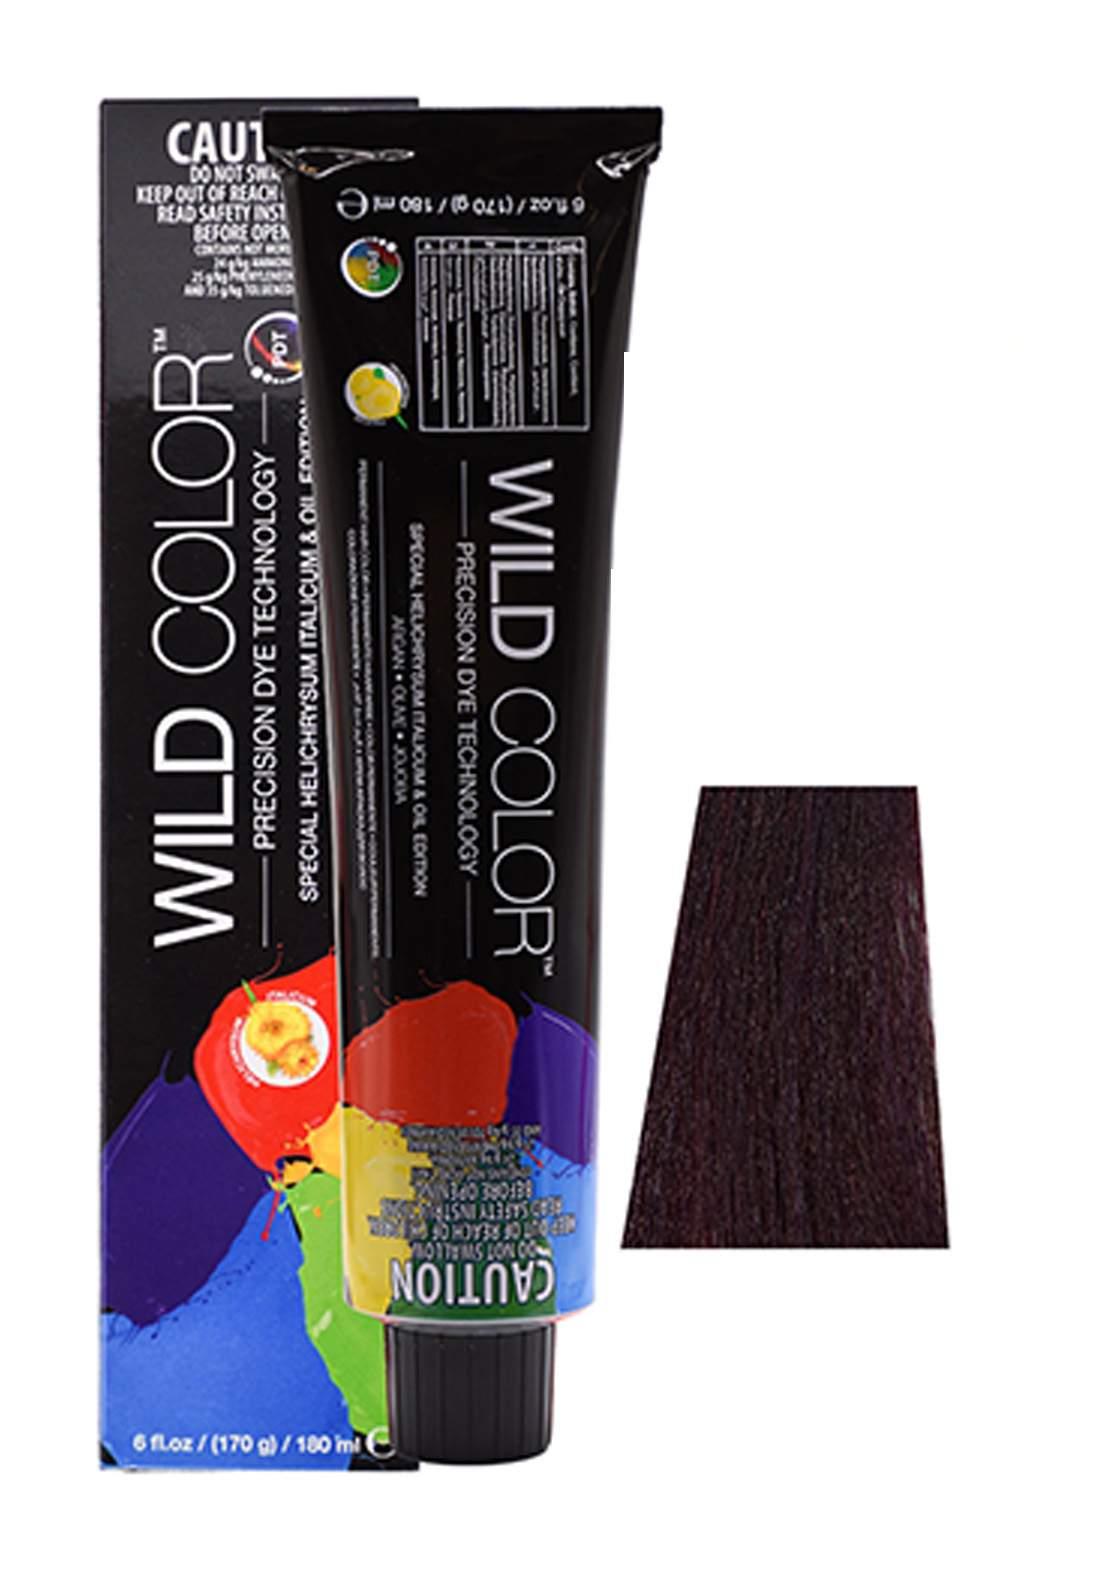 Wild Color Hair Color Cream 5.5 5M - Light Mahogany Brown صبغة شعر